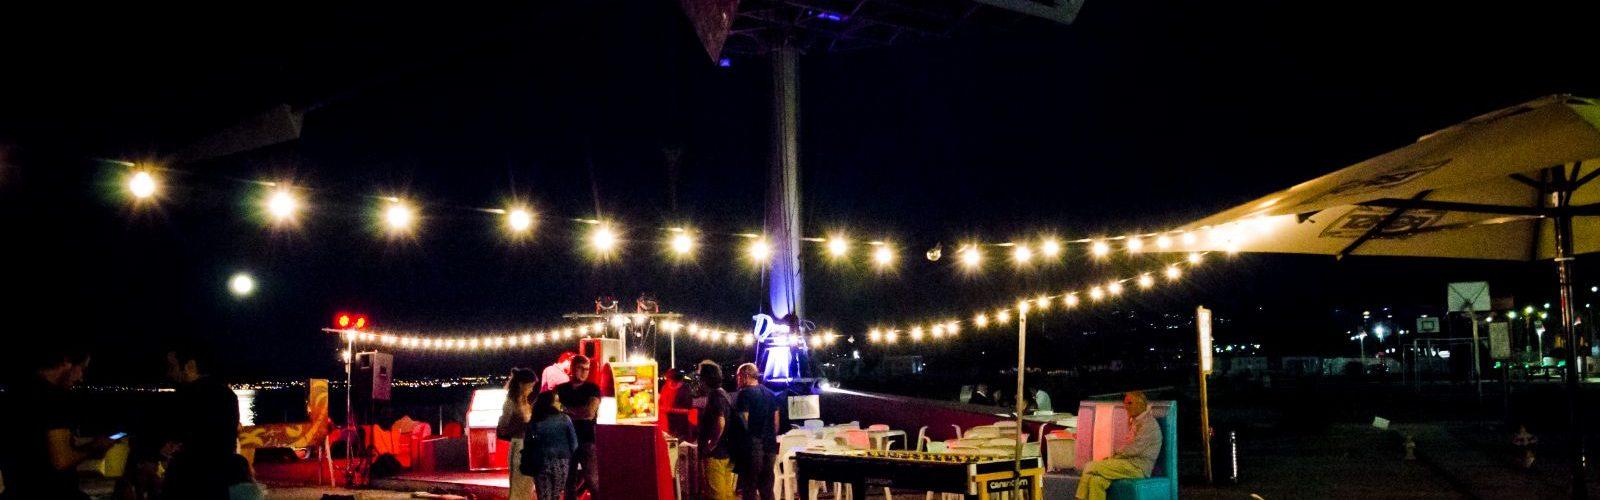 ILLUMINAZIONE VINTAGE - Caningam, Feste con Illuminazione Vintage, Festa con Illuminazione Vintage, Matrimonio con Illuminazione Vintage, Evento con Illuminazione Vintage, Illuminazione Vintage a Palermo